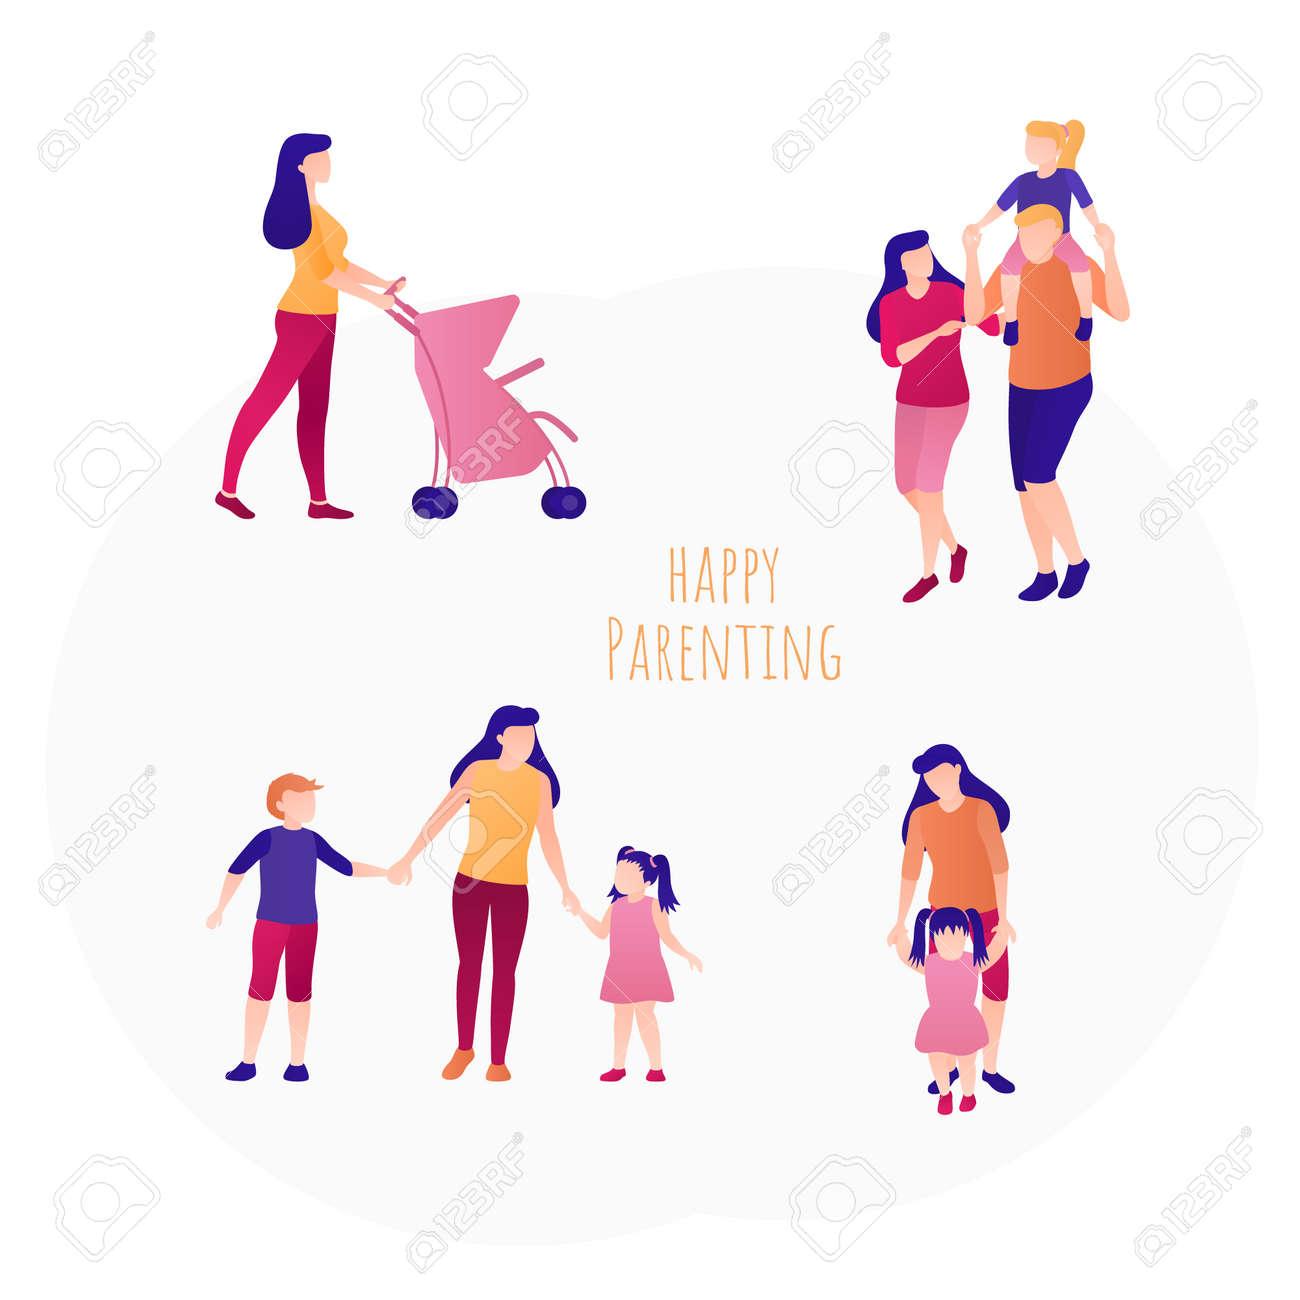 Happy parenting concept banner flat design set - 170260494